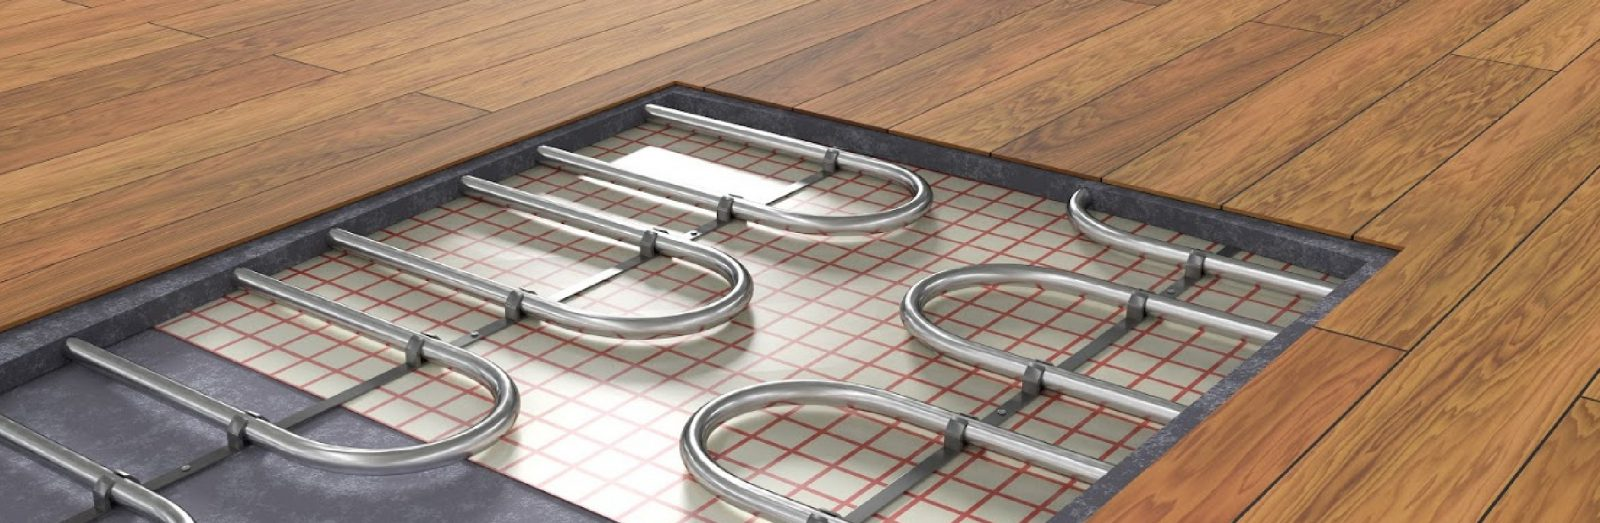 Vloerverwarming repareren of onderhoud